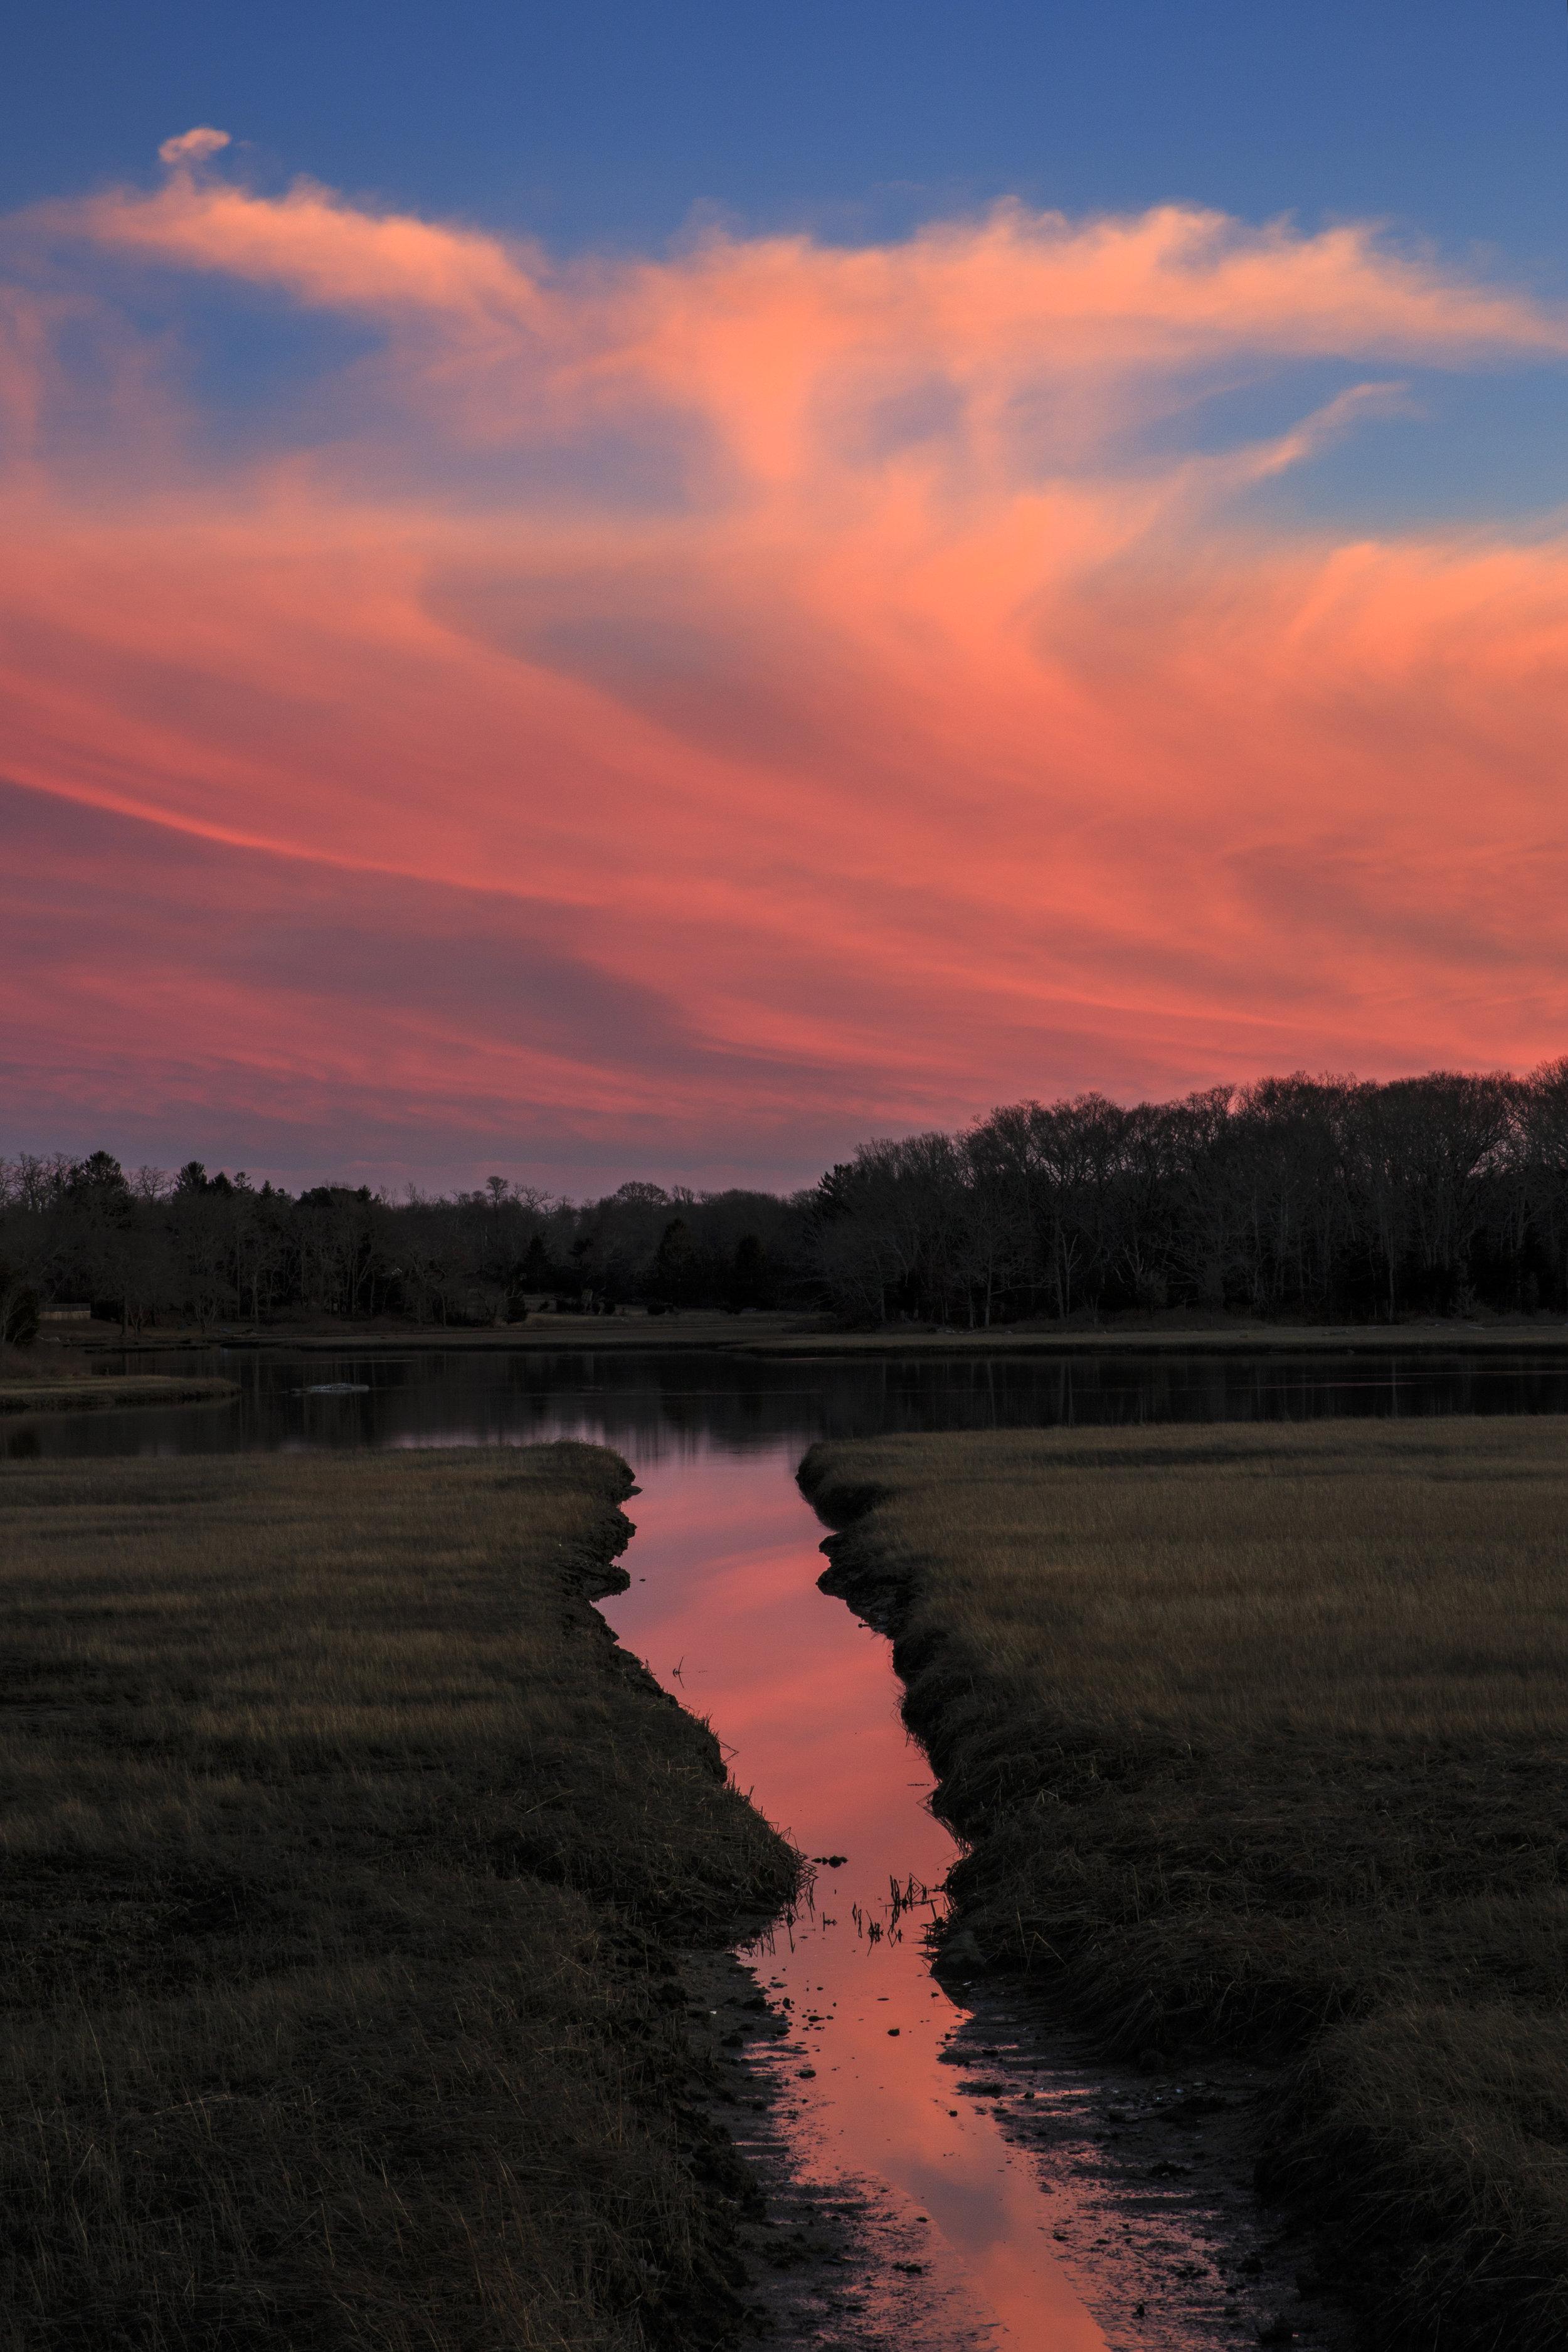 Salt Marsh Sunset - South Dartmouth, MA